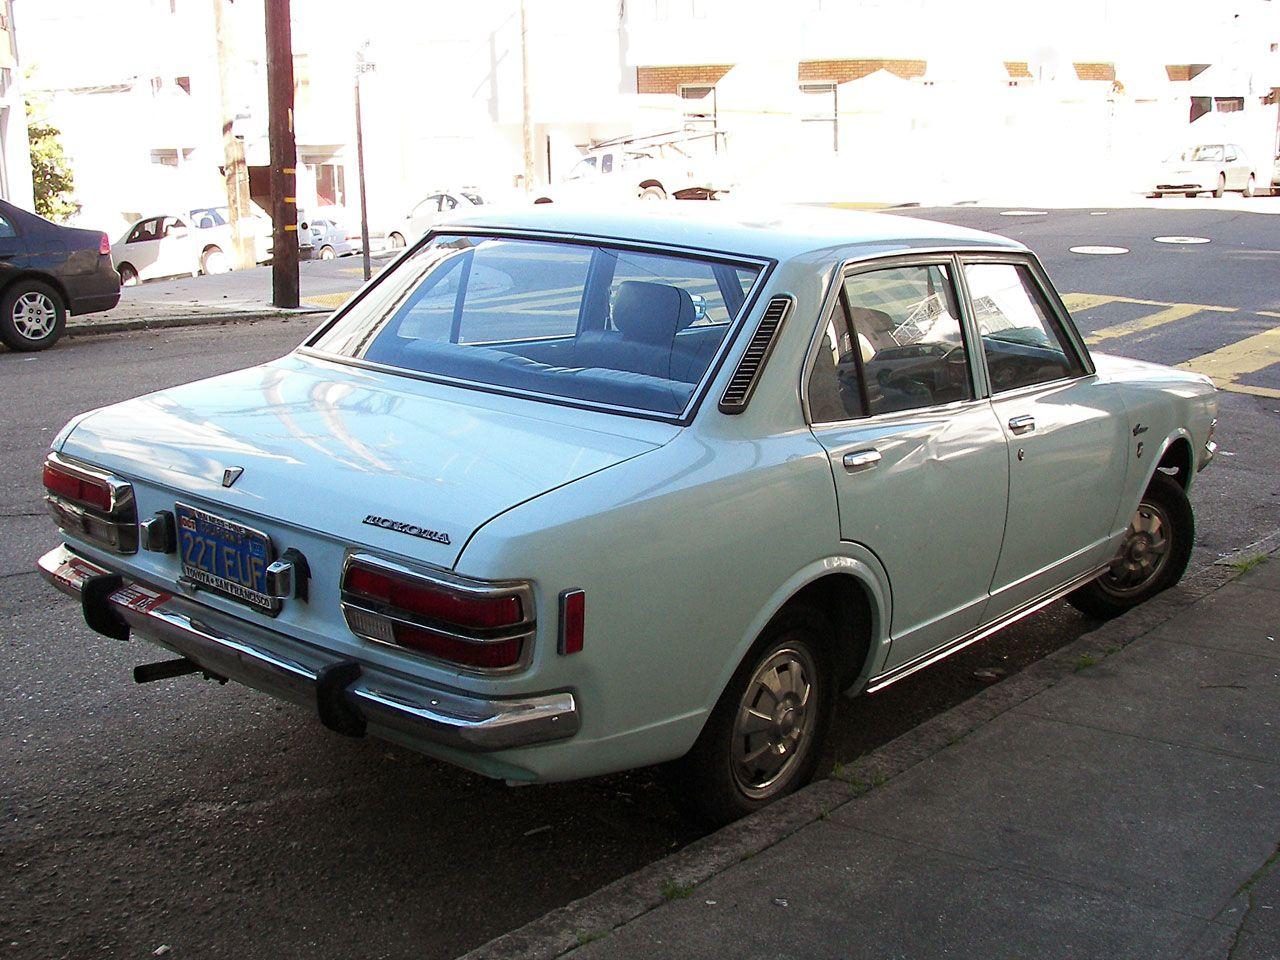 1970 toyota corona vintage consumer cars pinterest toyota corona toyota and cars